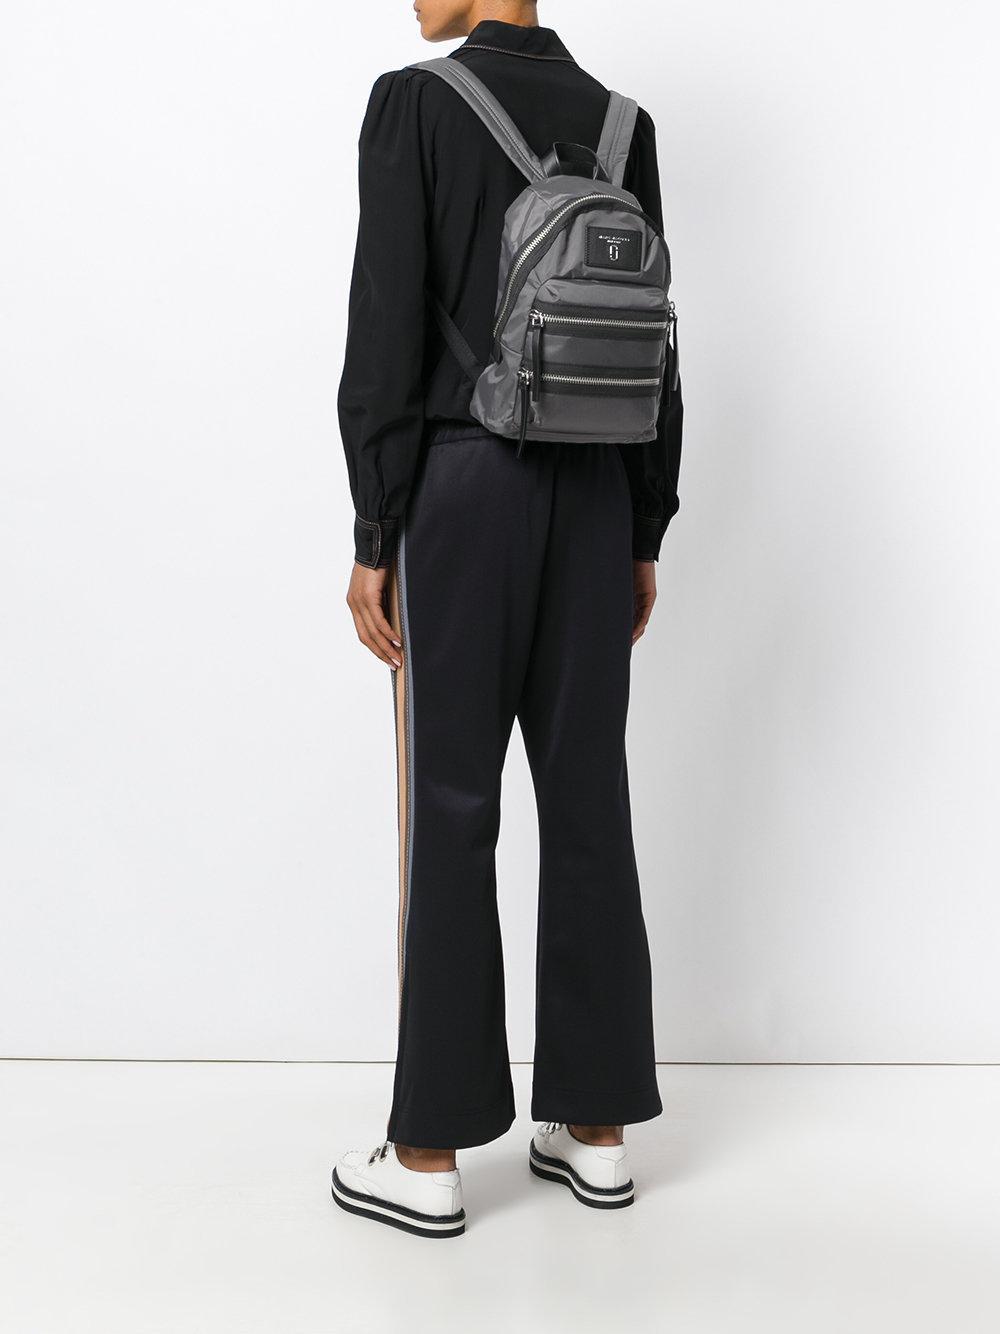 Marc Jacobs Leather Biker Mini Backpack in Grey (Grey)